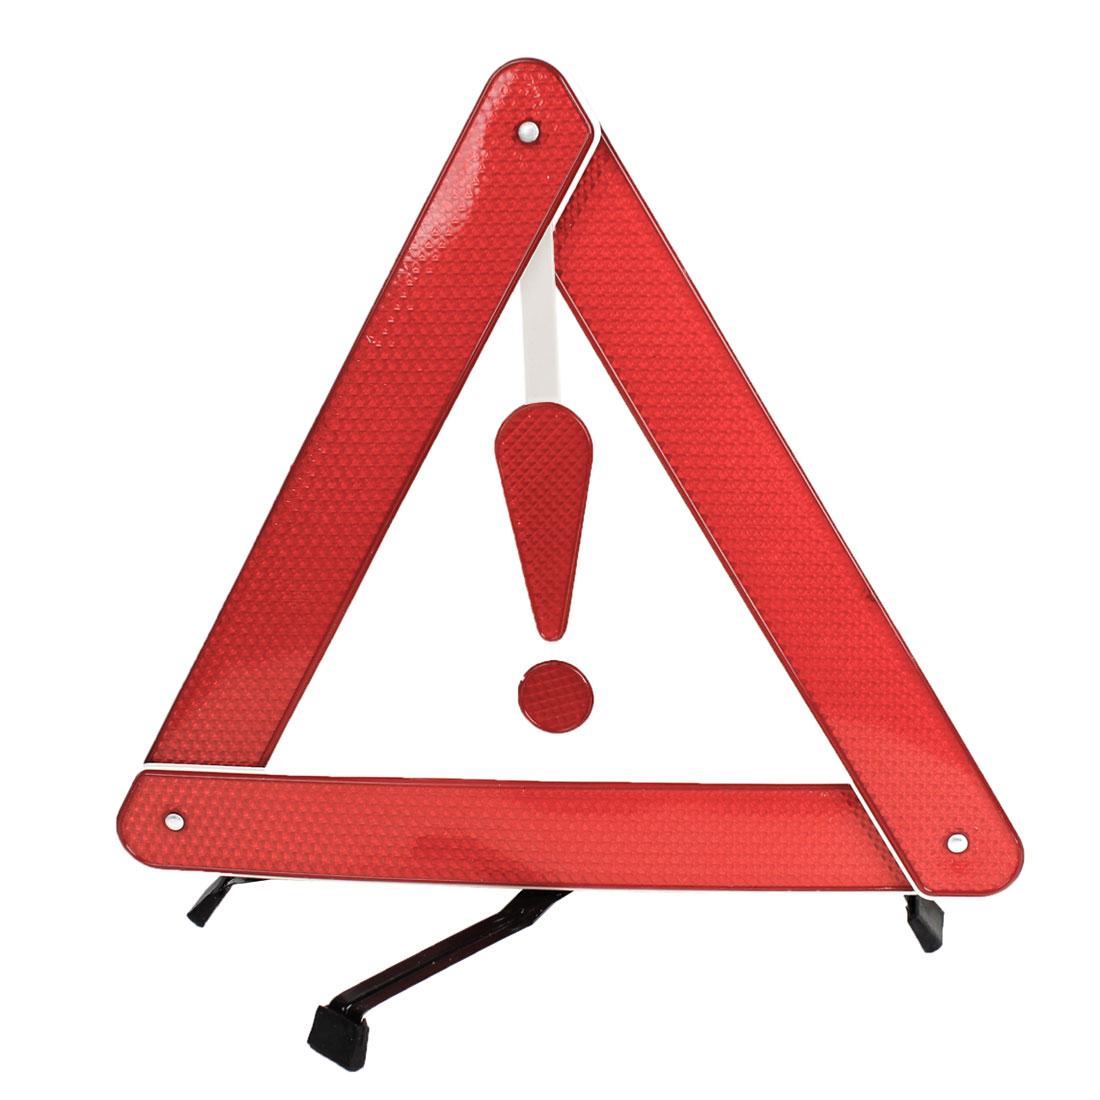 Block Road Black Red Metal Braket Safety Warning Reflection Triangle